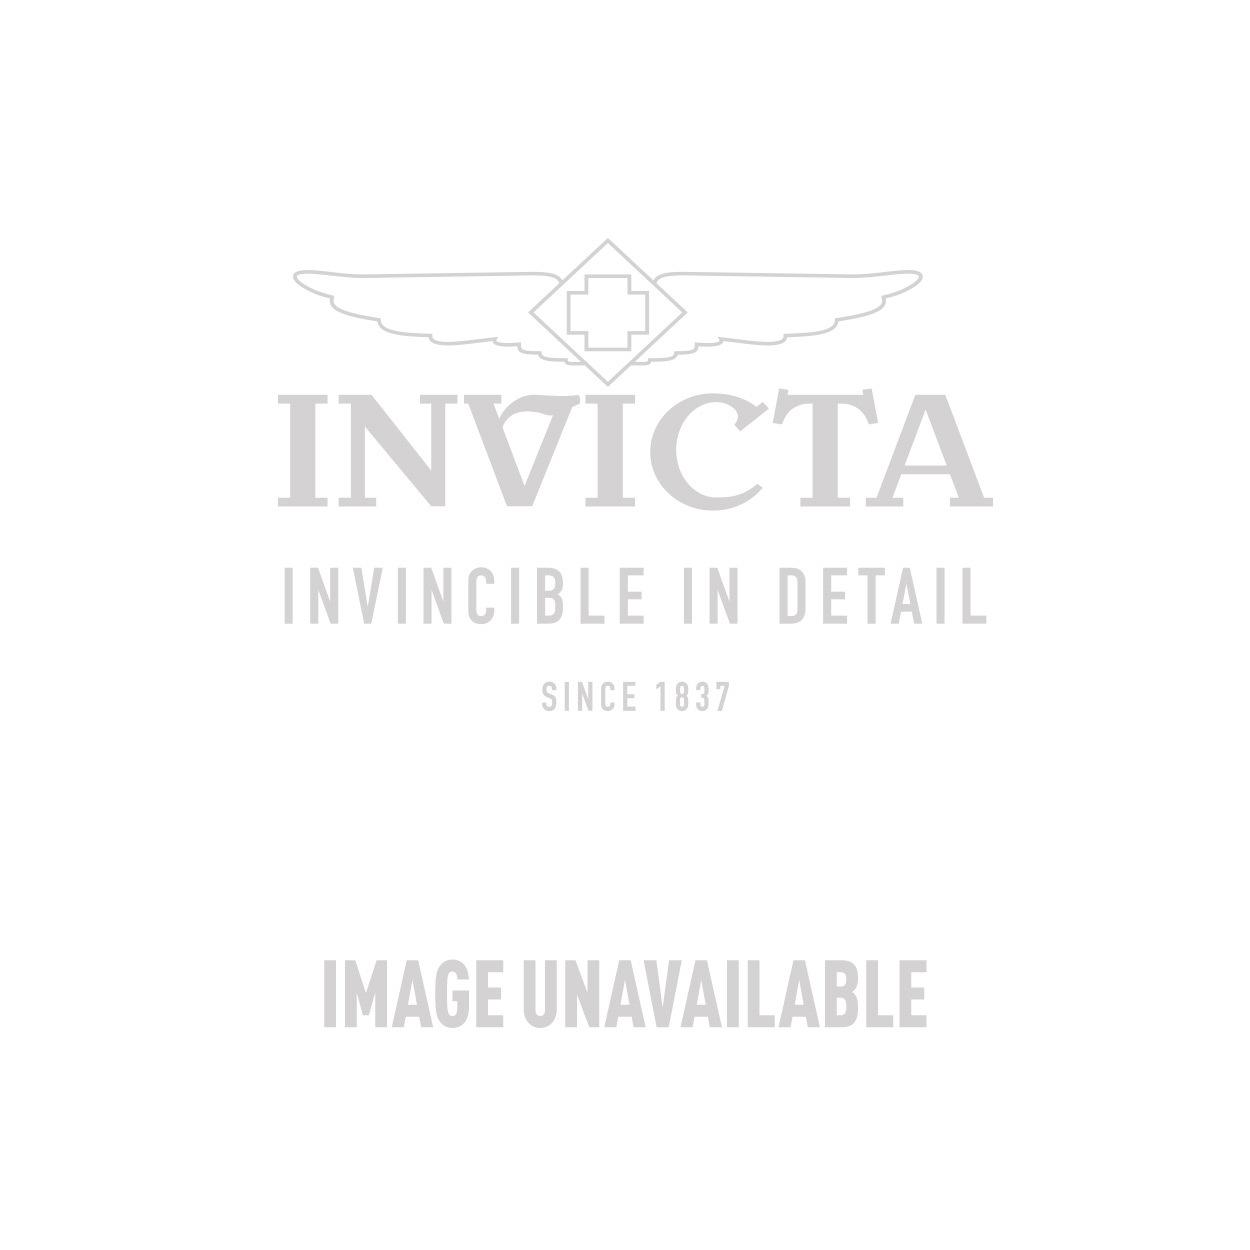 Invicta Bolt Watch In Orange Stainless Steel At